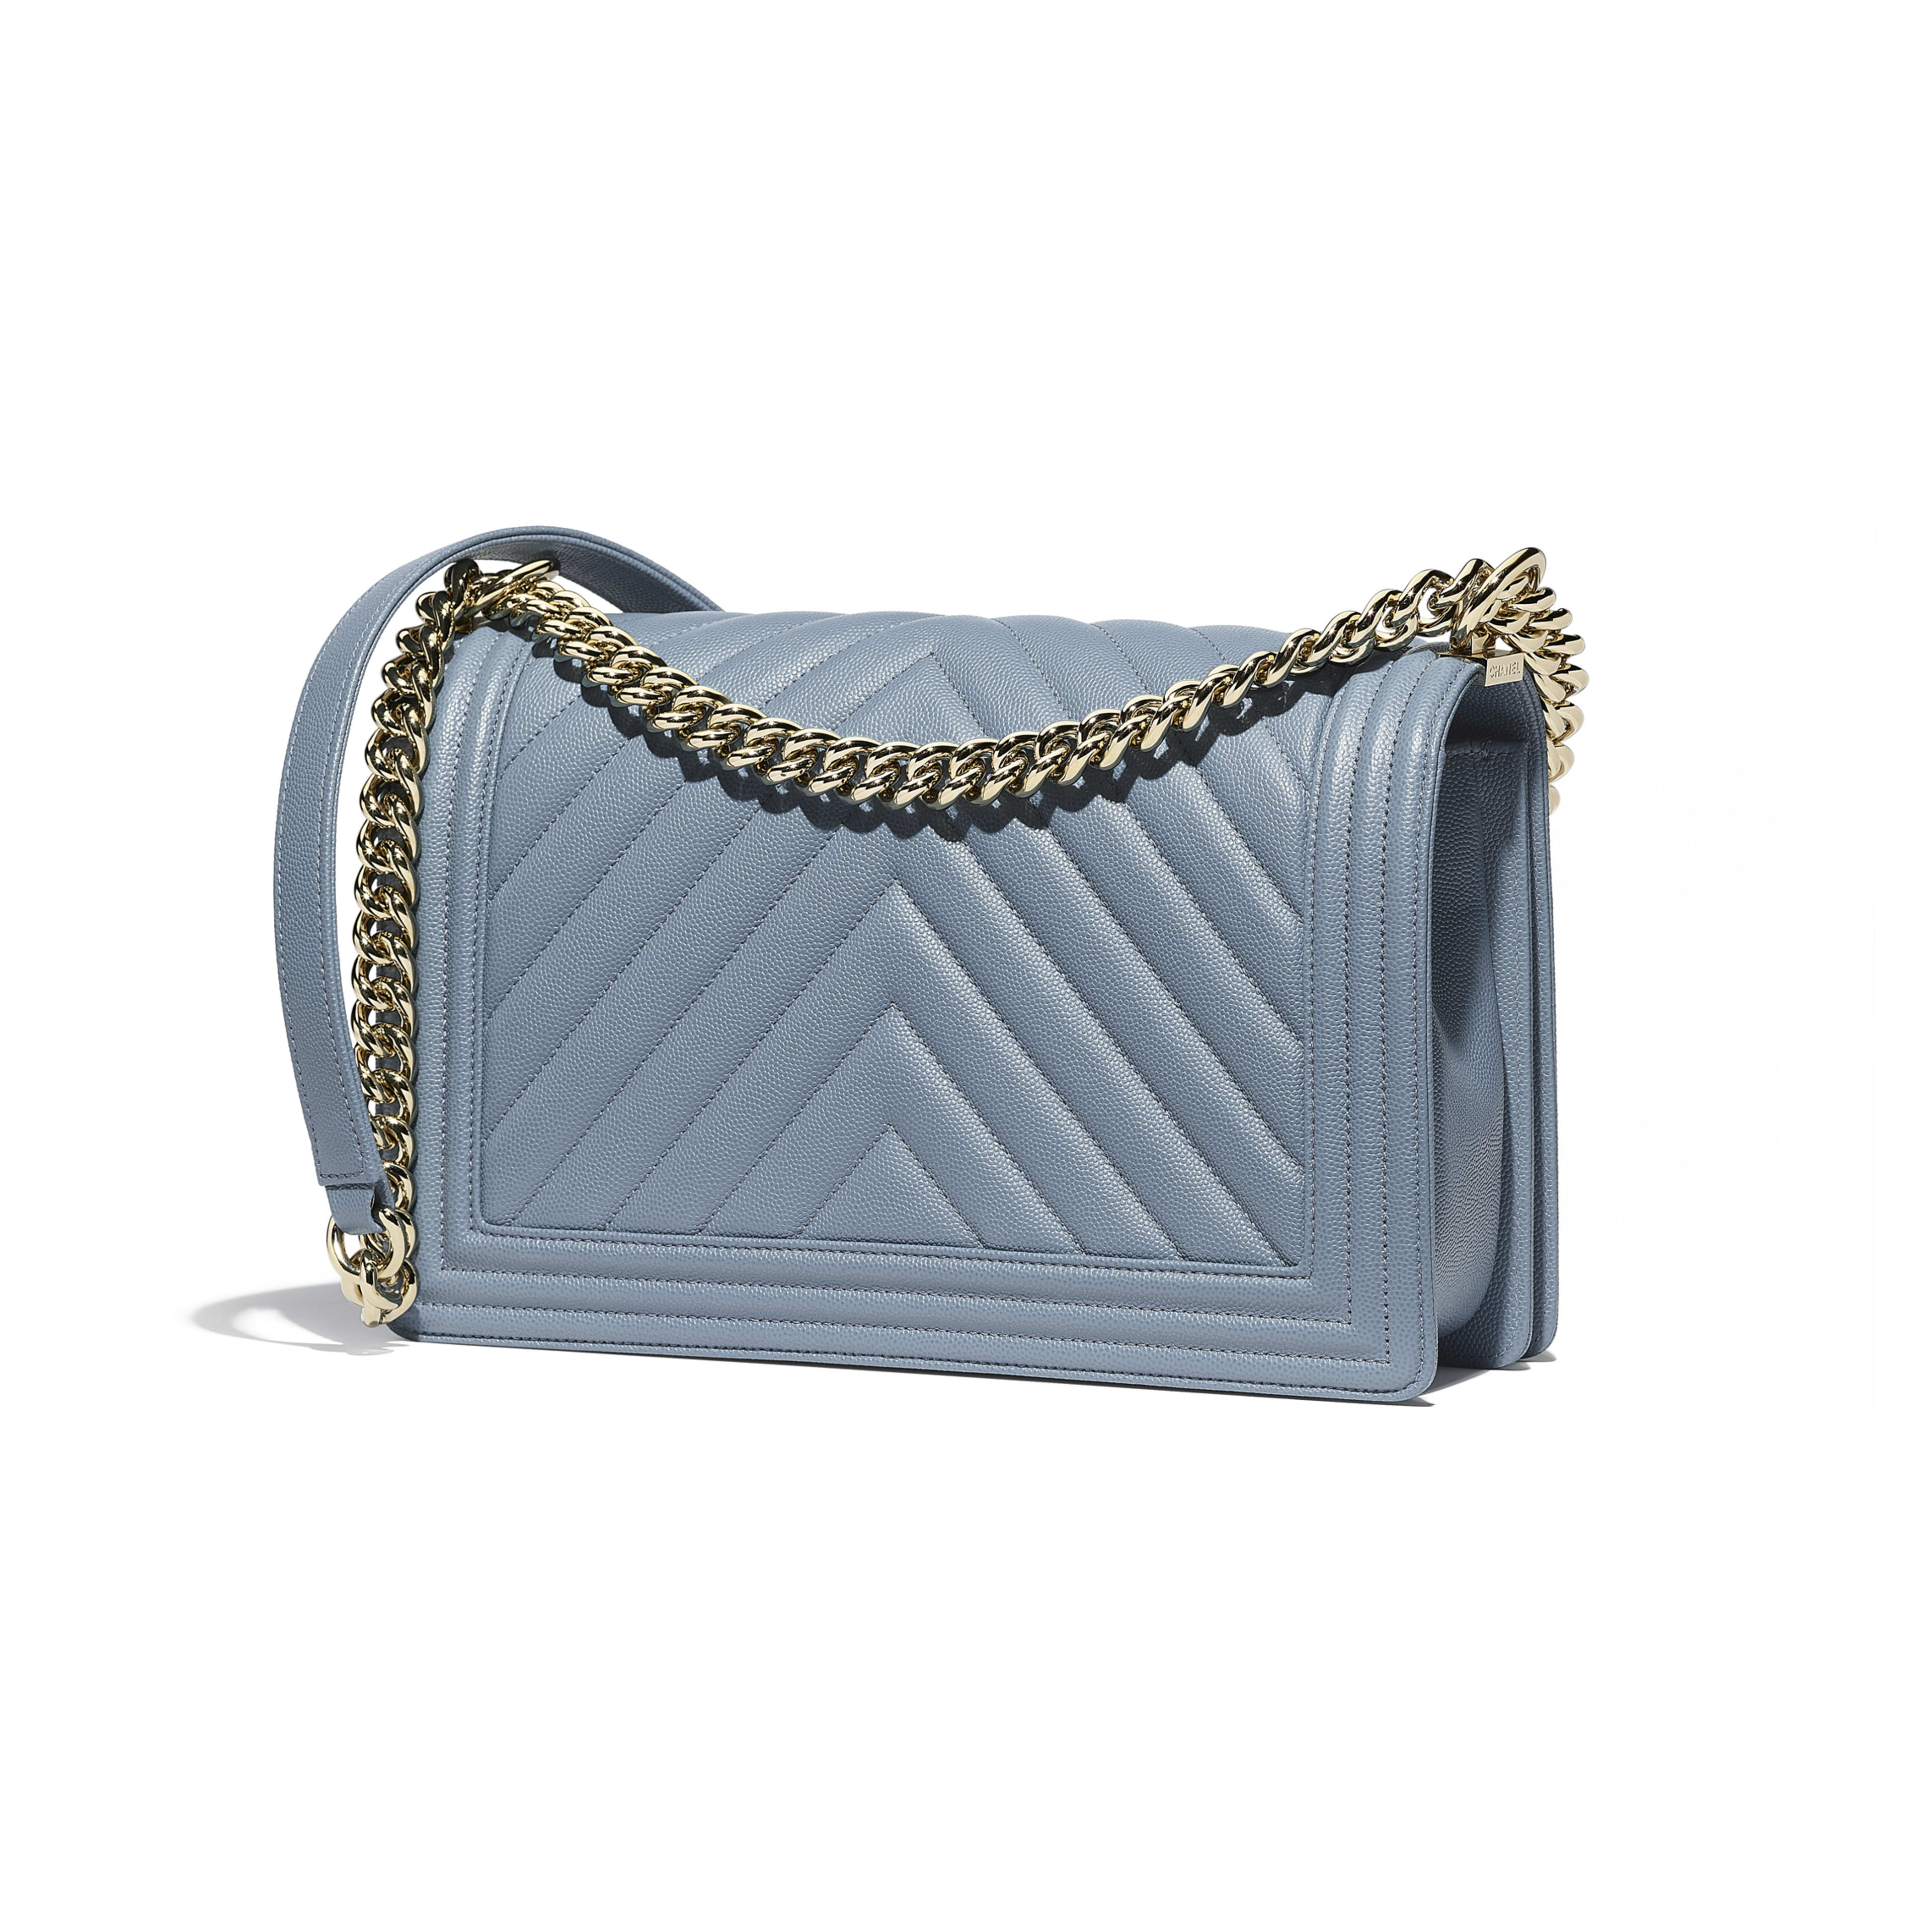 48e03ec9e52ca6 Grained Calfskin & Gold-Tone Metal Blue Large BOY CHANEL Handbag | CHANEL